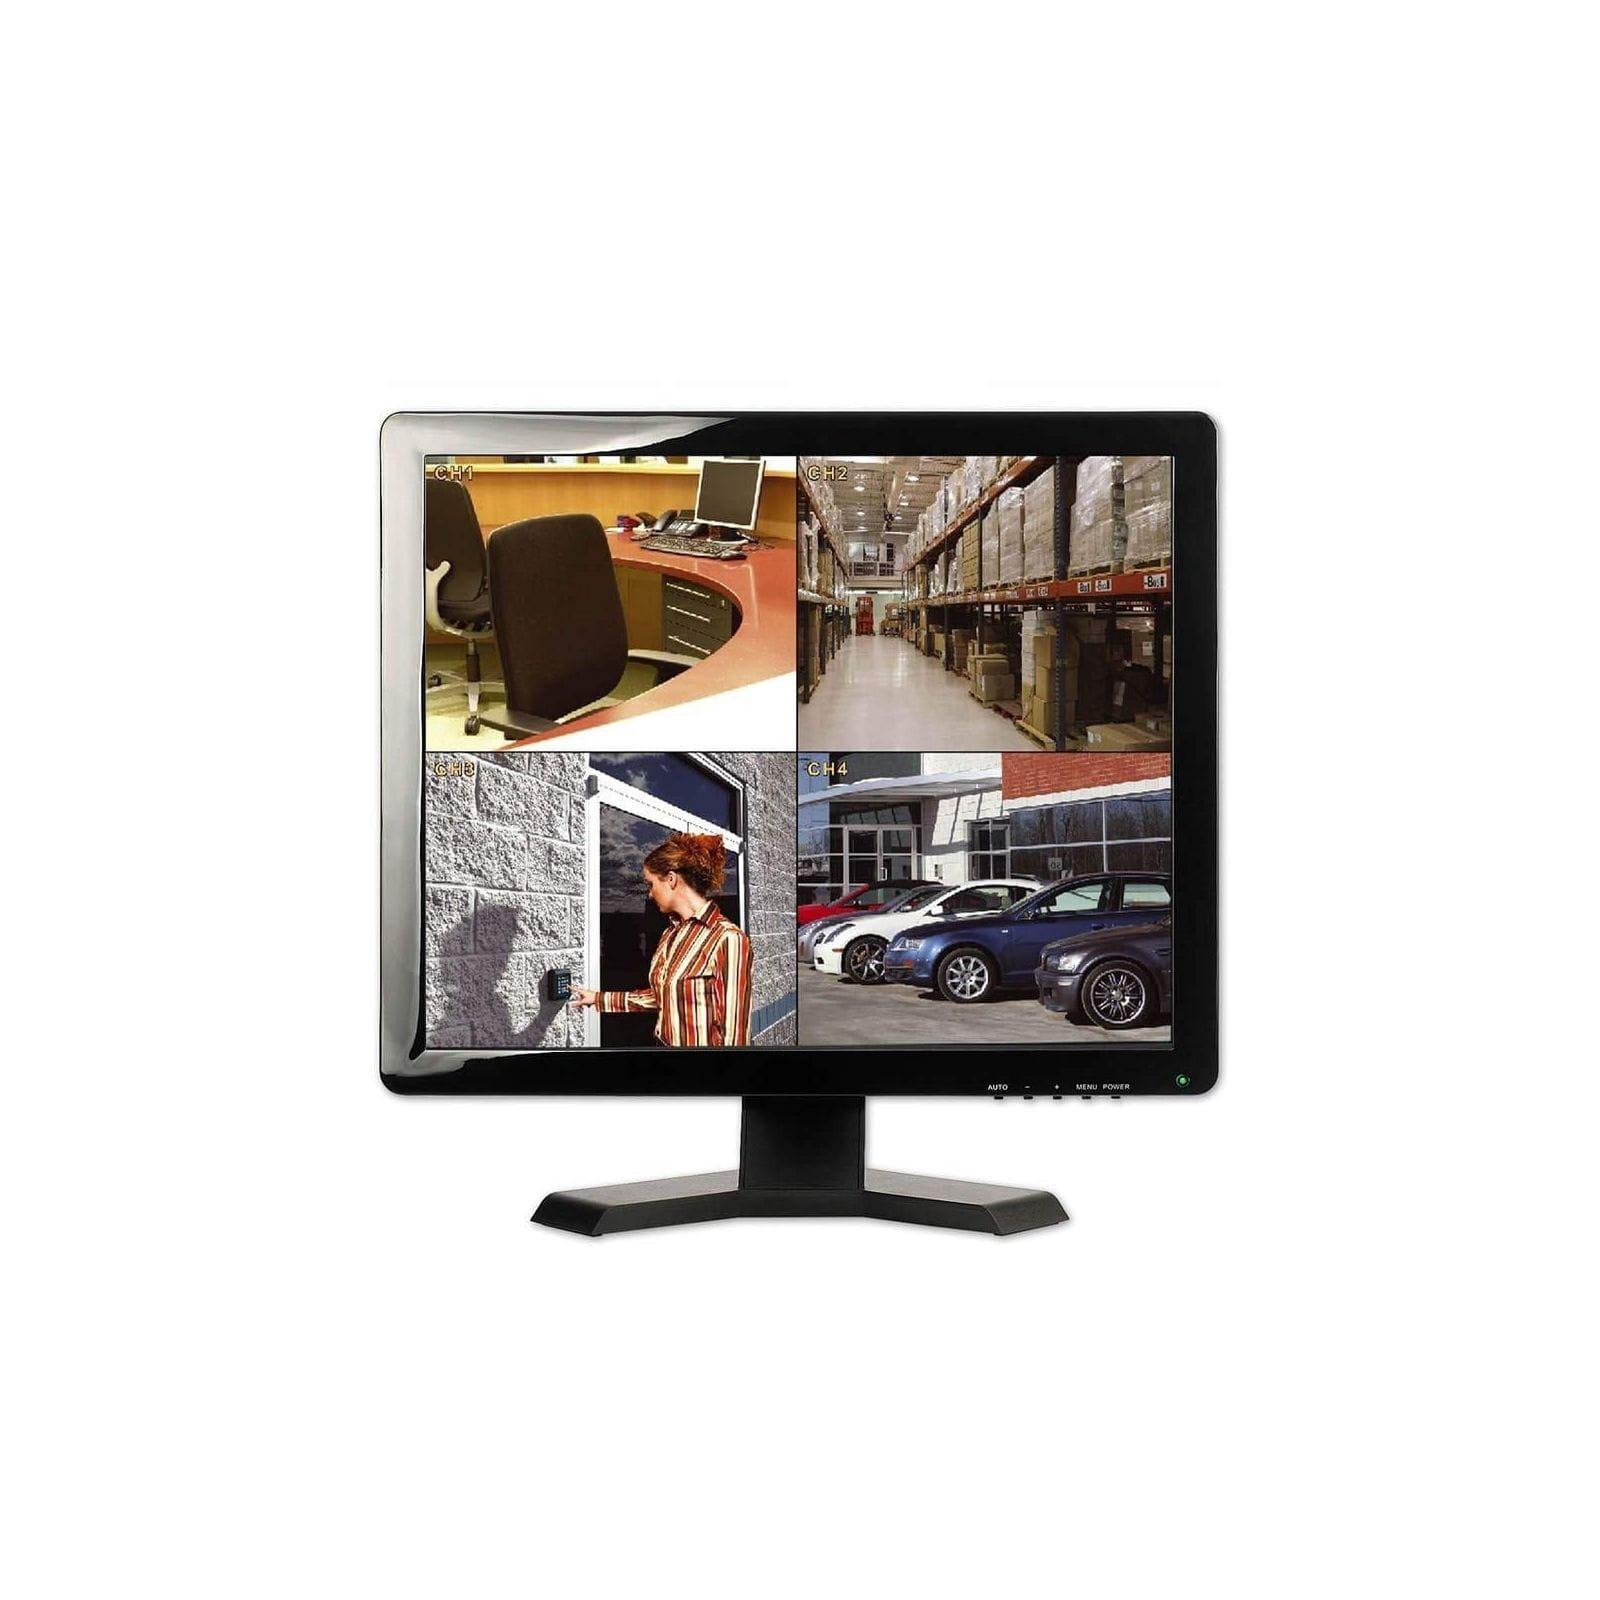 ECRAN BNC 19 POUCES AVEC HDMI VGA 1080P